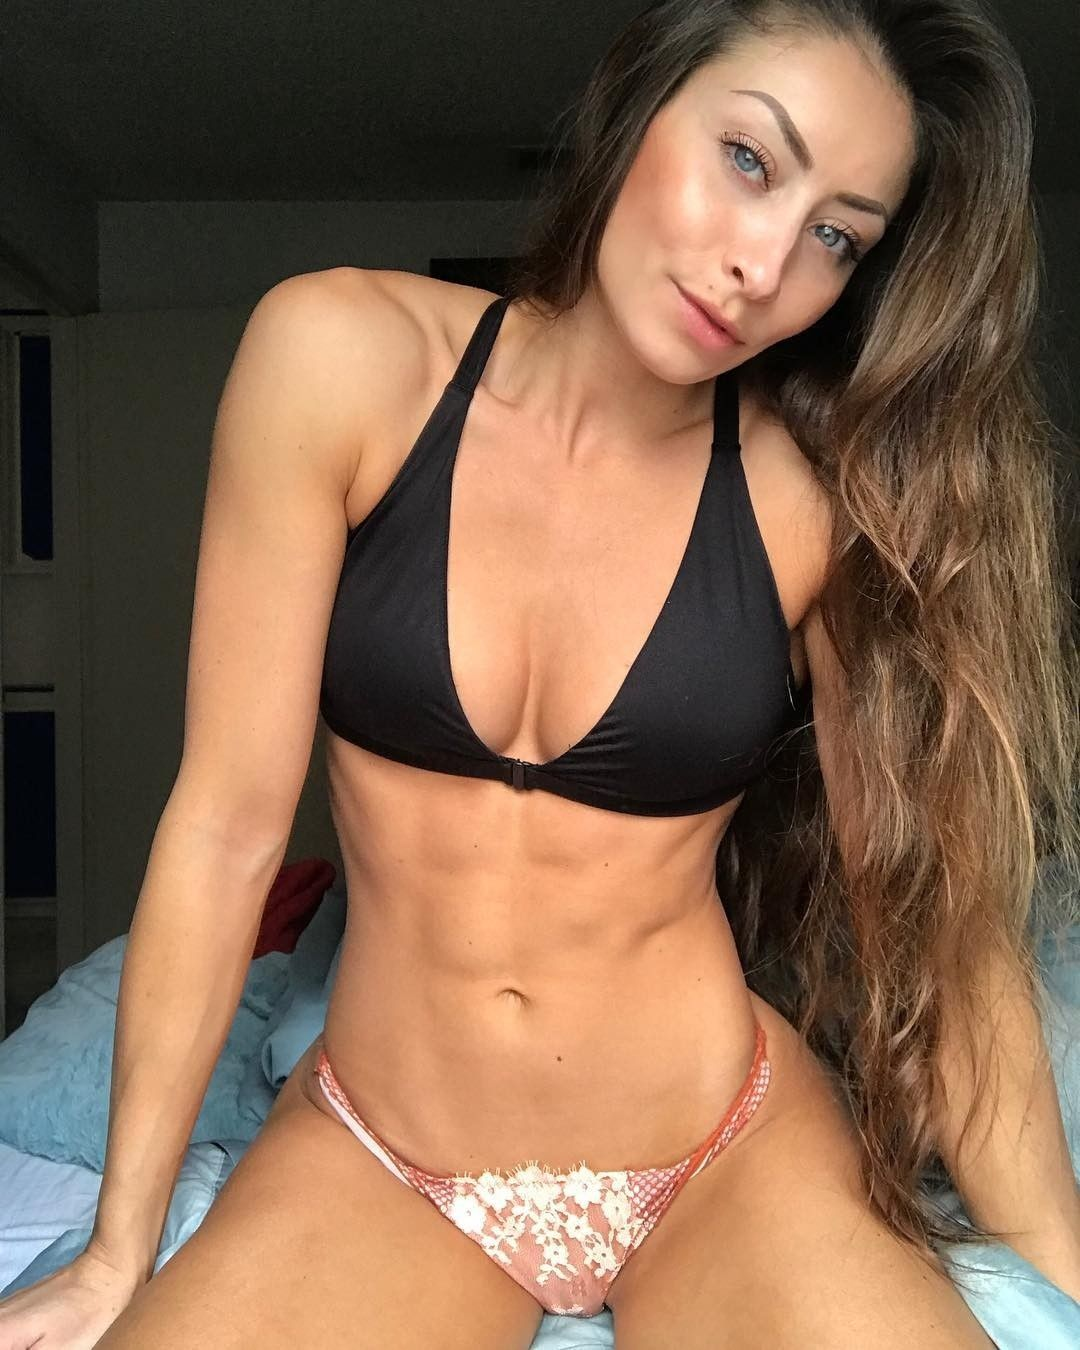 Ass Hot Stephanie Marie naked photo 2017